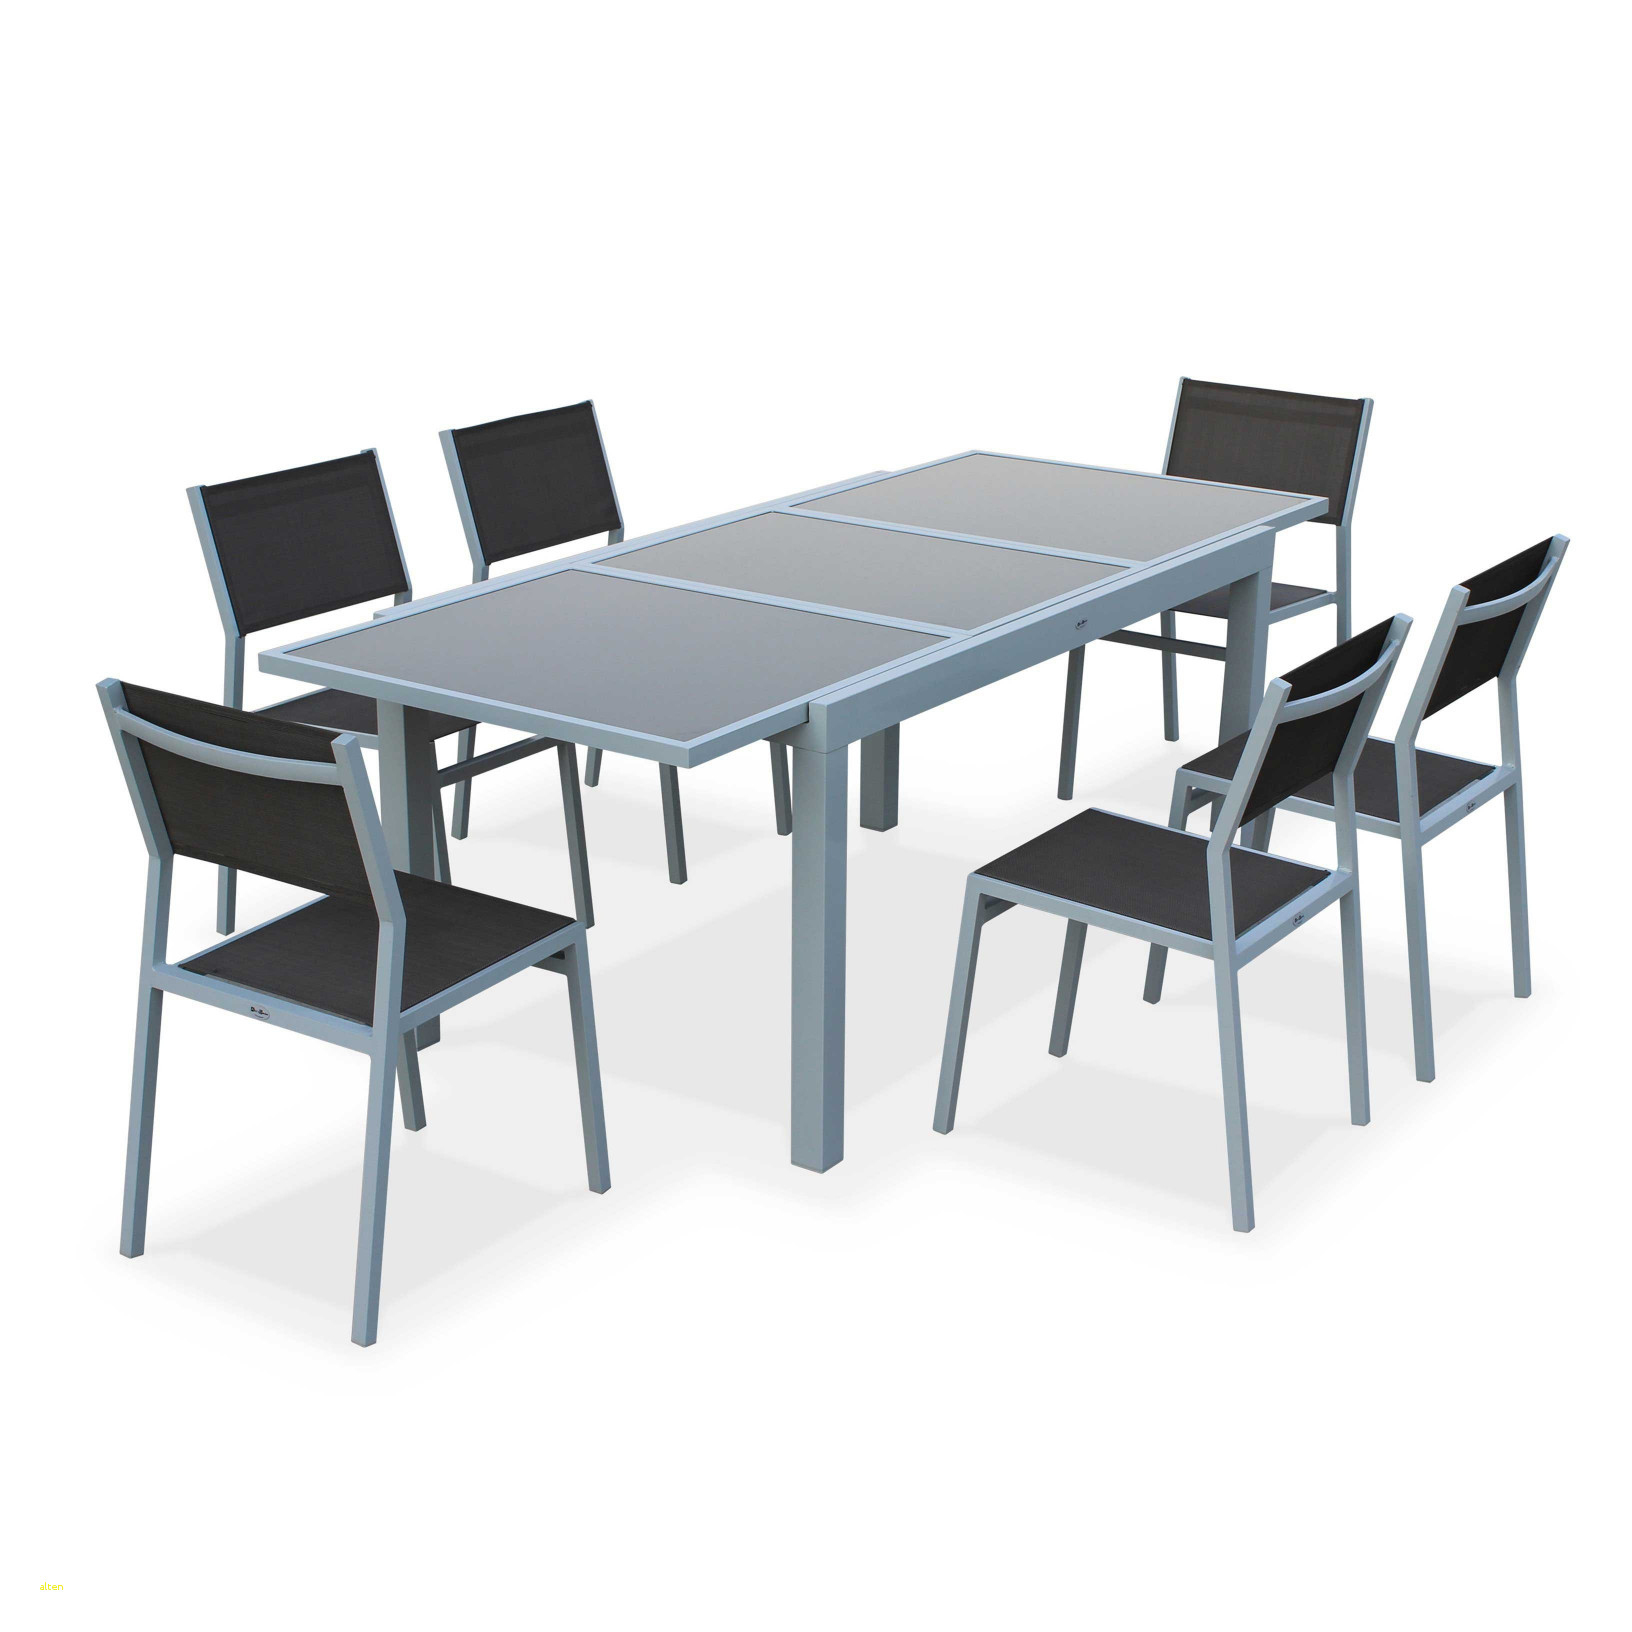 Petite Table Pliante Gifi Luxe Photographie 20 Fantastique Table De Jardin Gifi Design